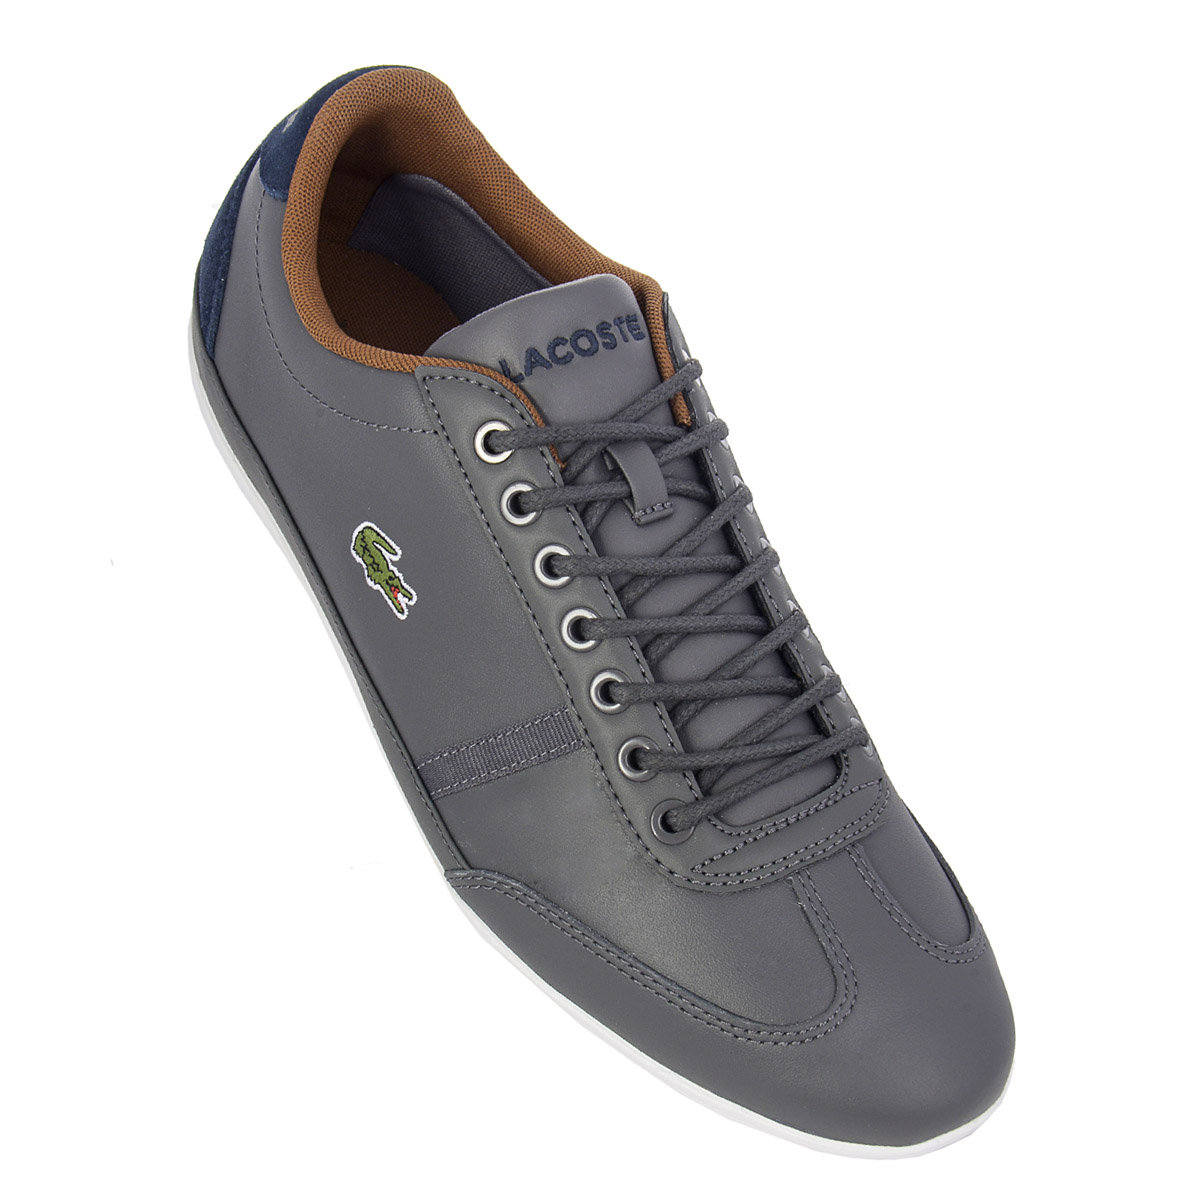 NEU Lacoste Lacoste Lacoste Misano Sport Herren Schuhe Grau CAM0046248 SALE 0c388c